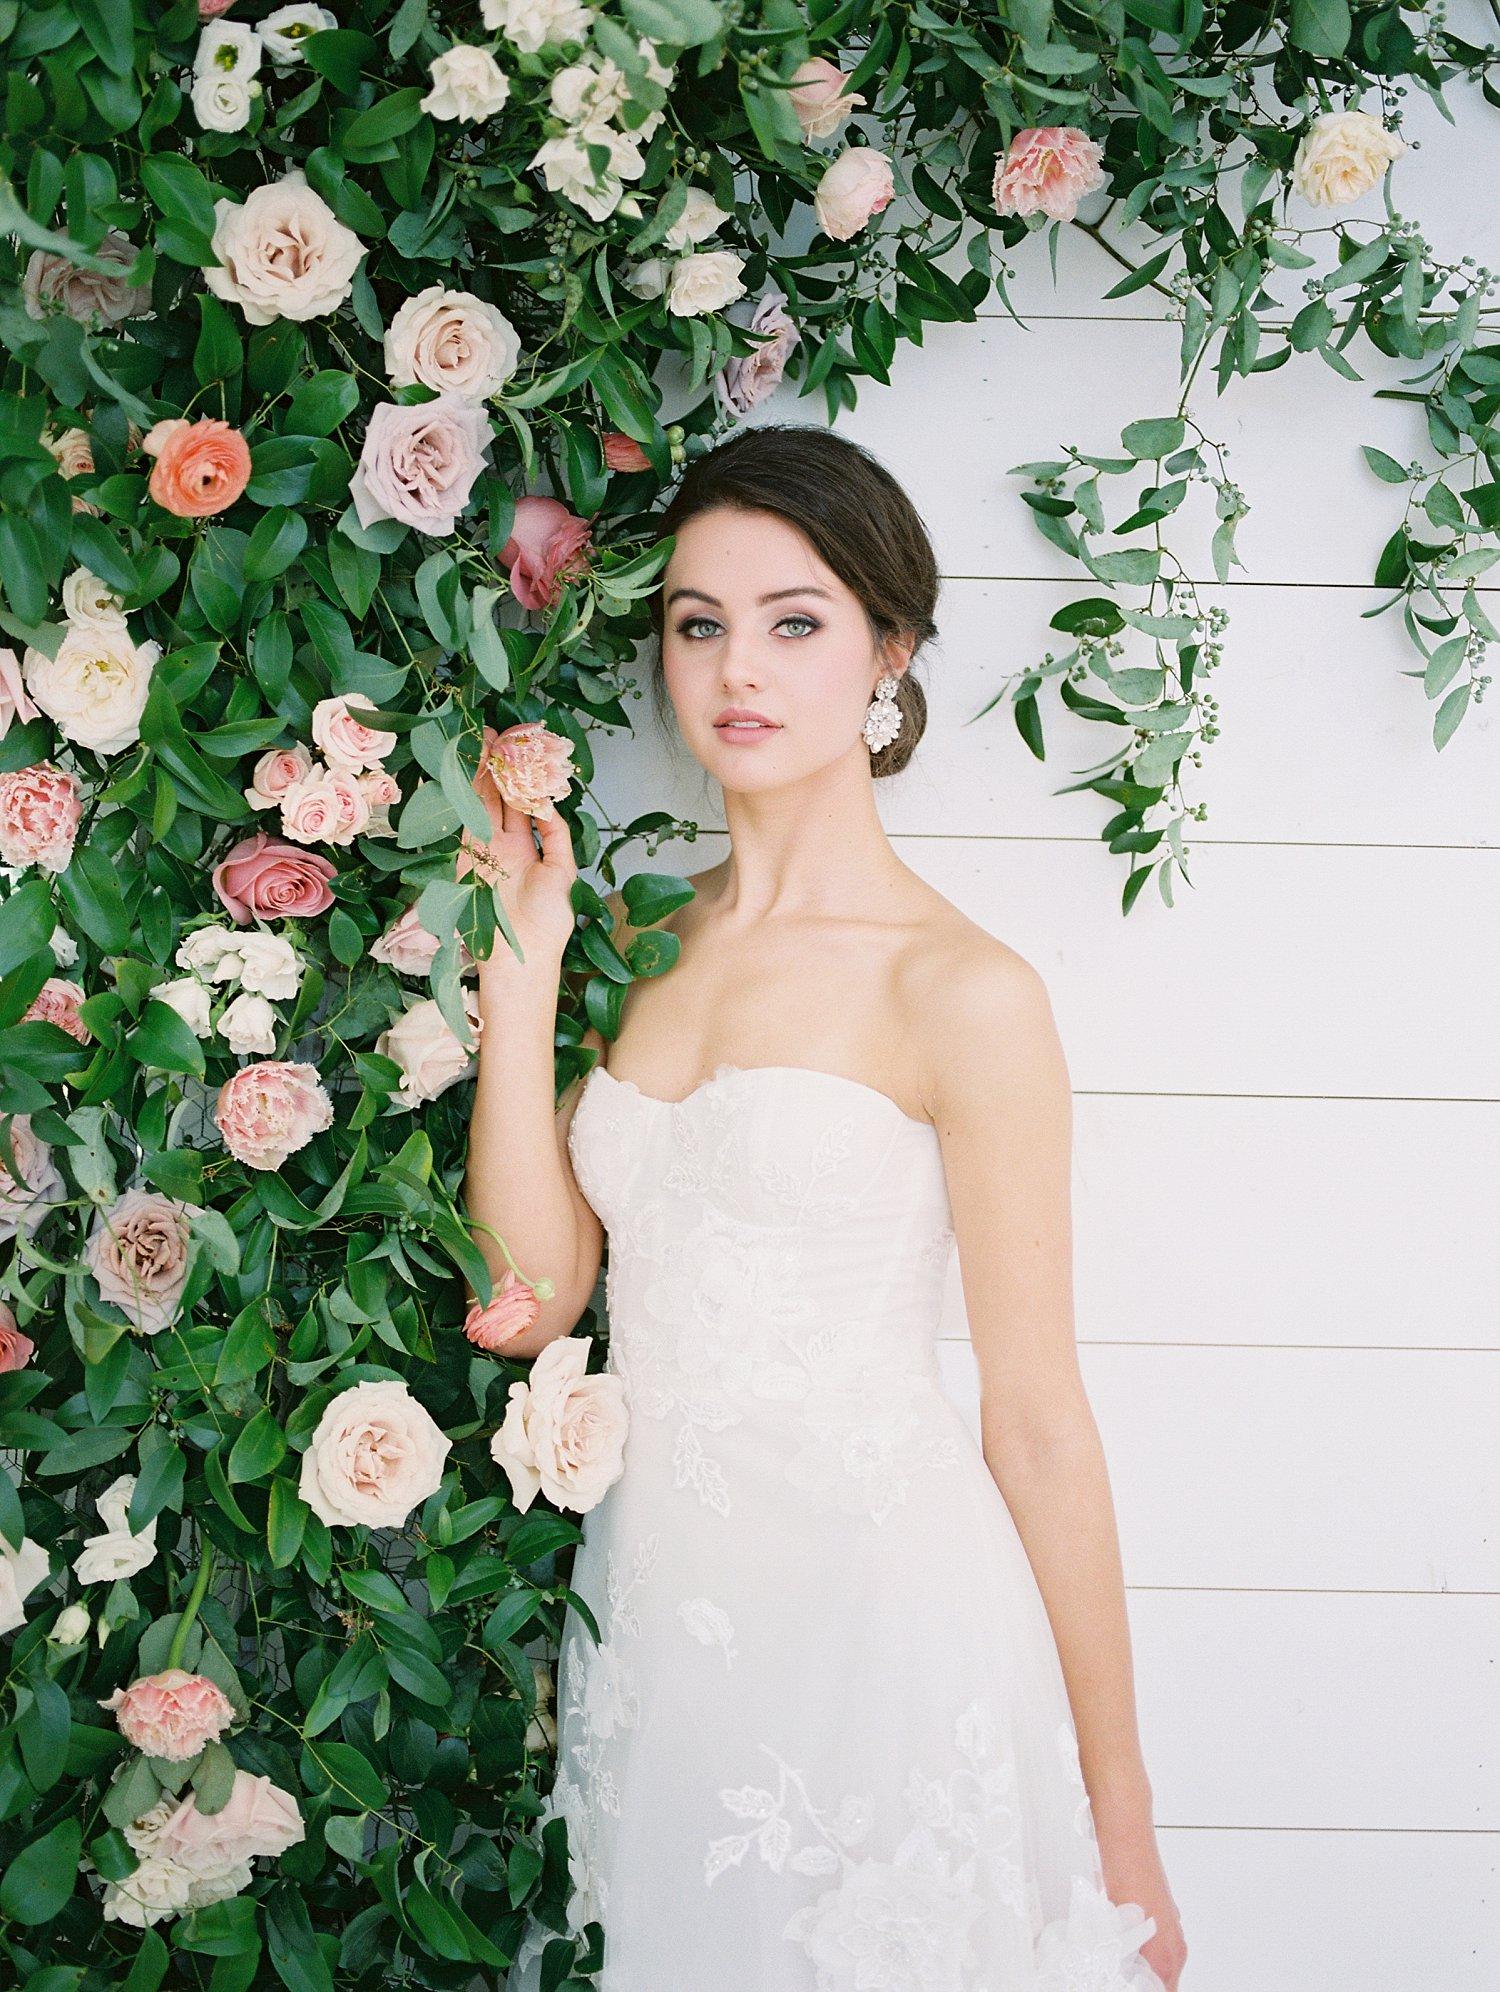 Bride standing next to a rose bush